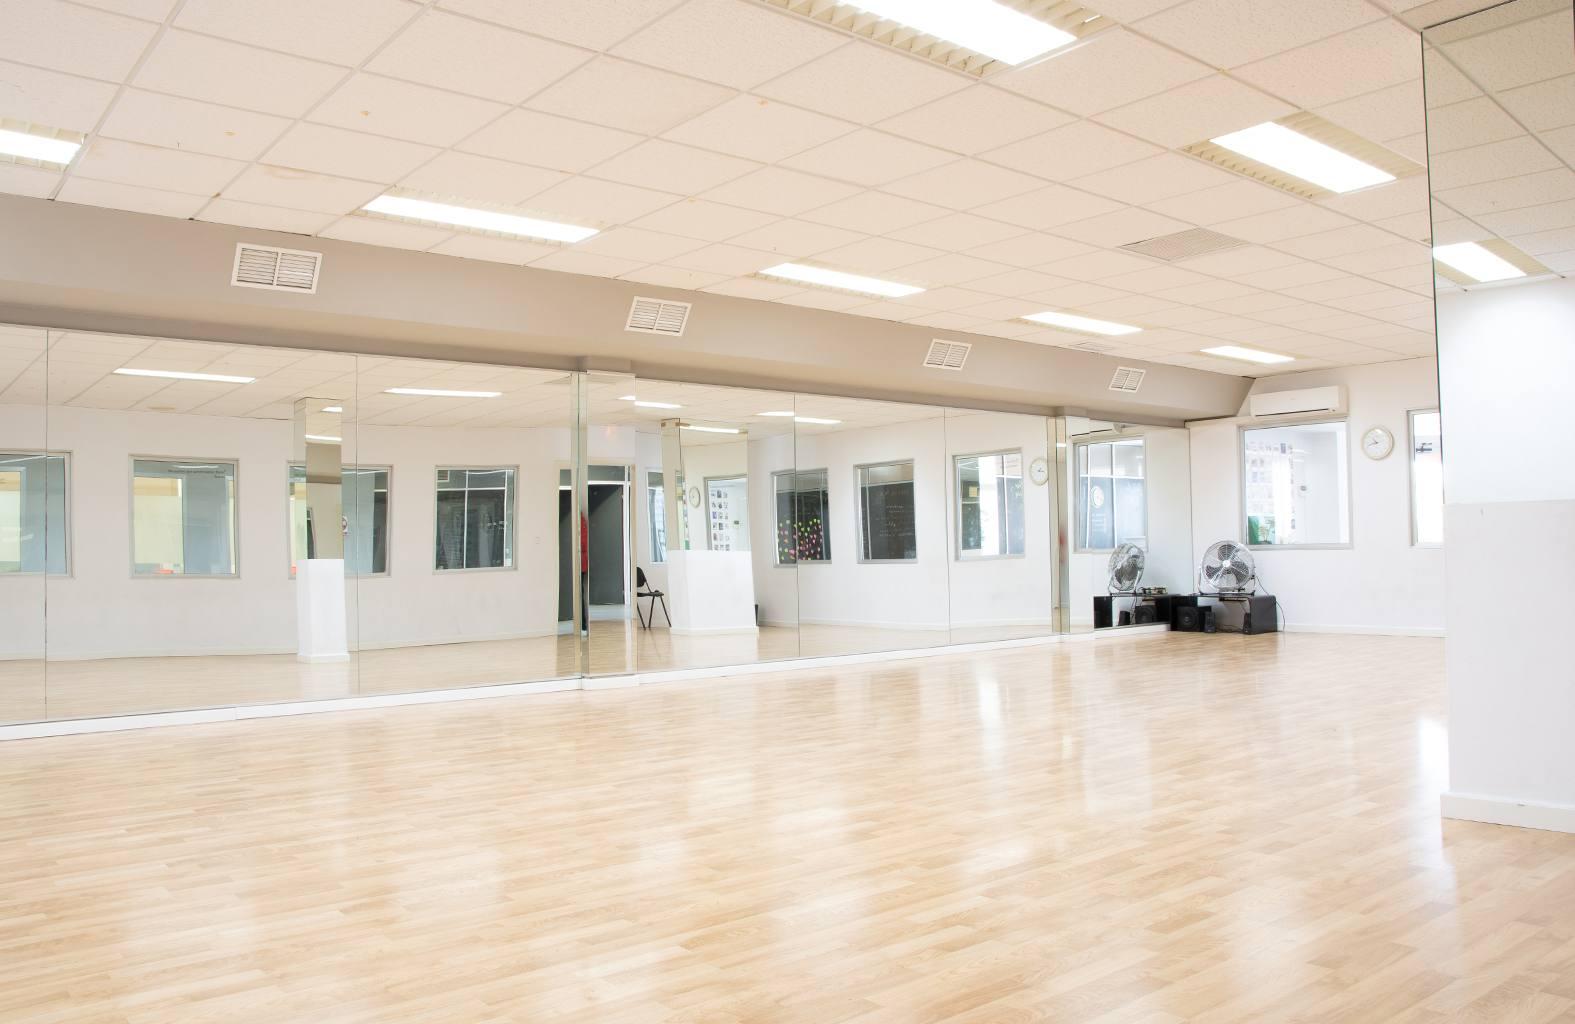 sala de danza - stardanze